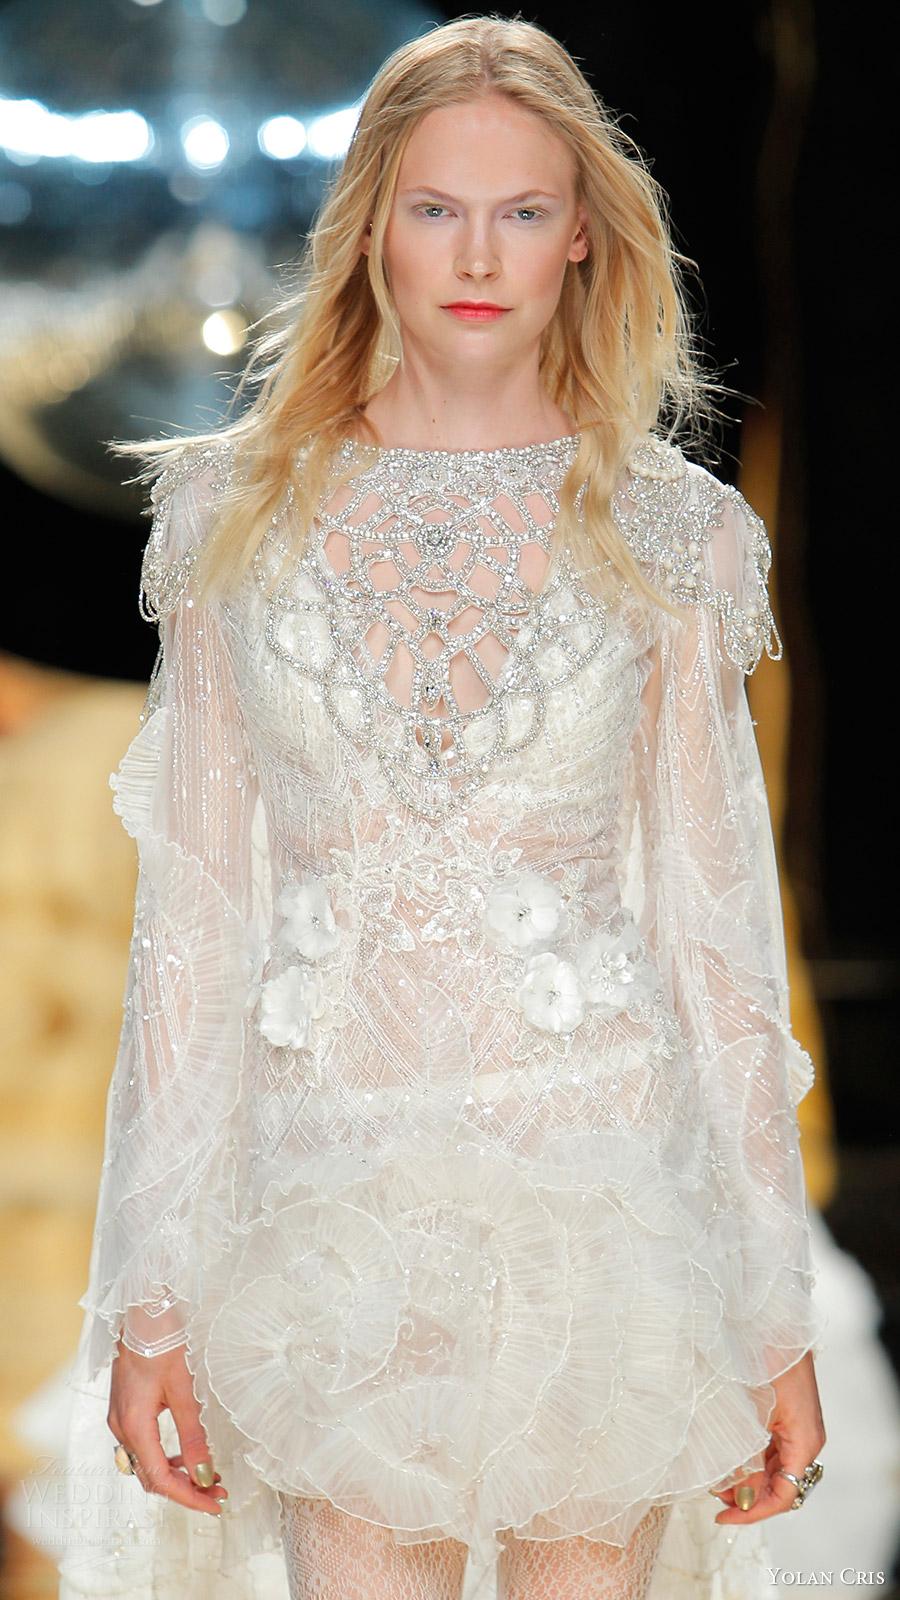 Yolancris Long Sleeve Wedding Dress : Yolan cris bridal wedding dresses crazyforus